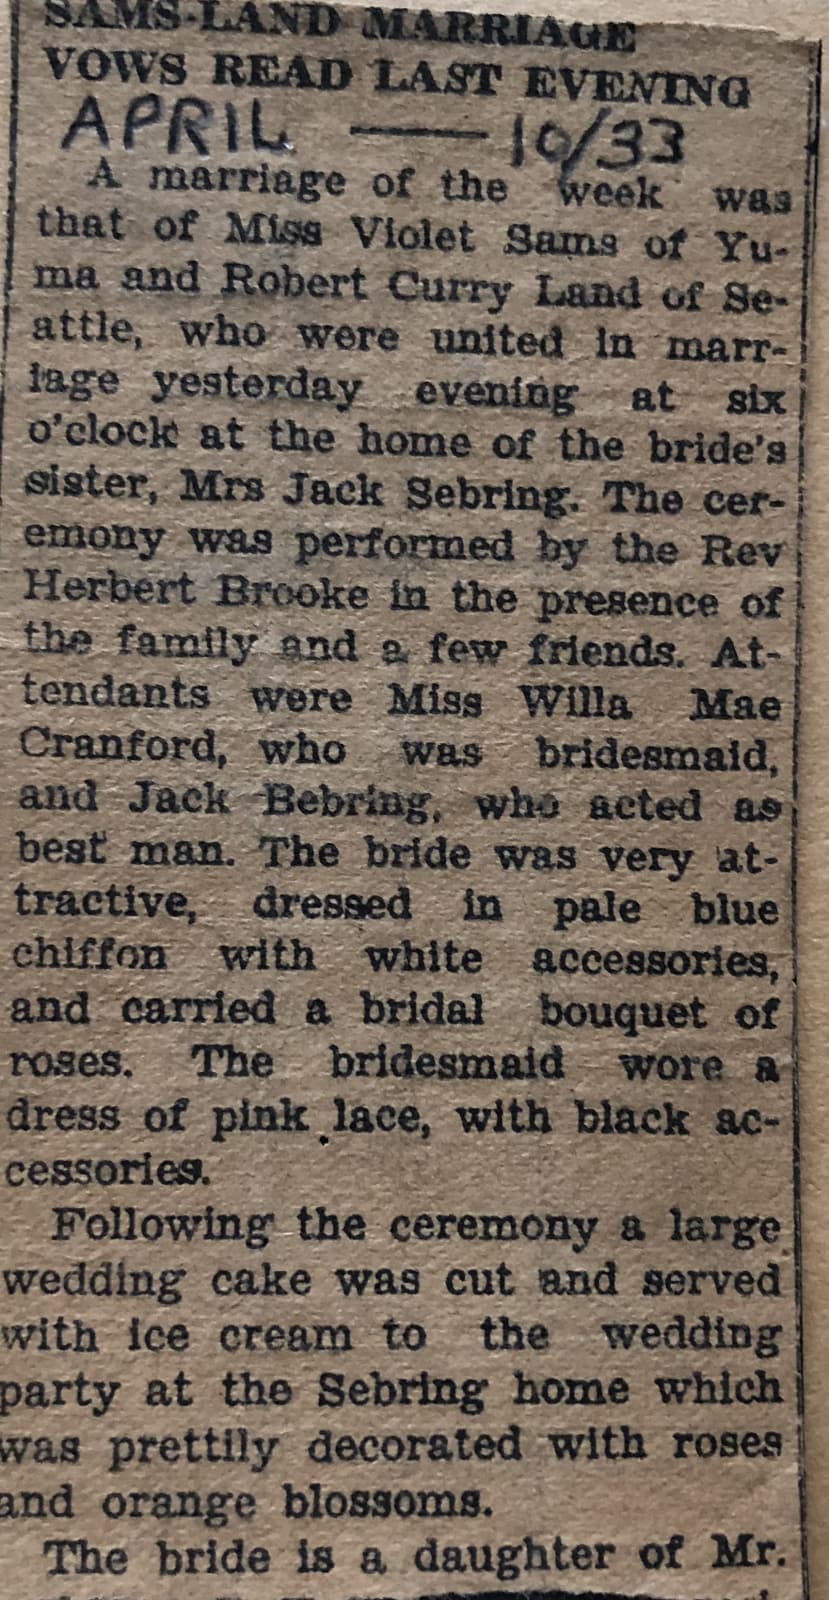 Bob and Vi's wedding announcement, April 1933.